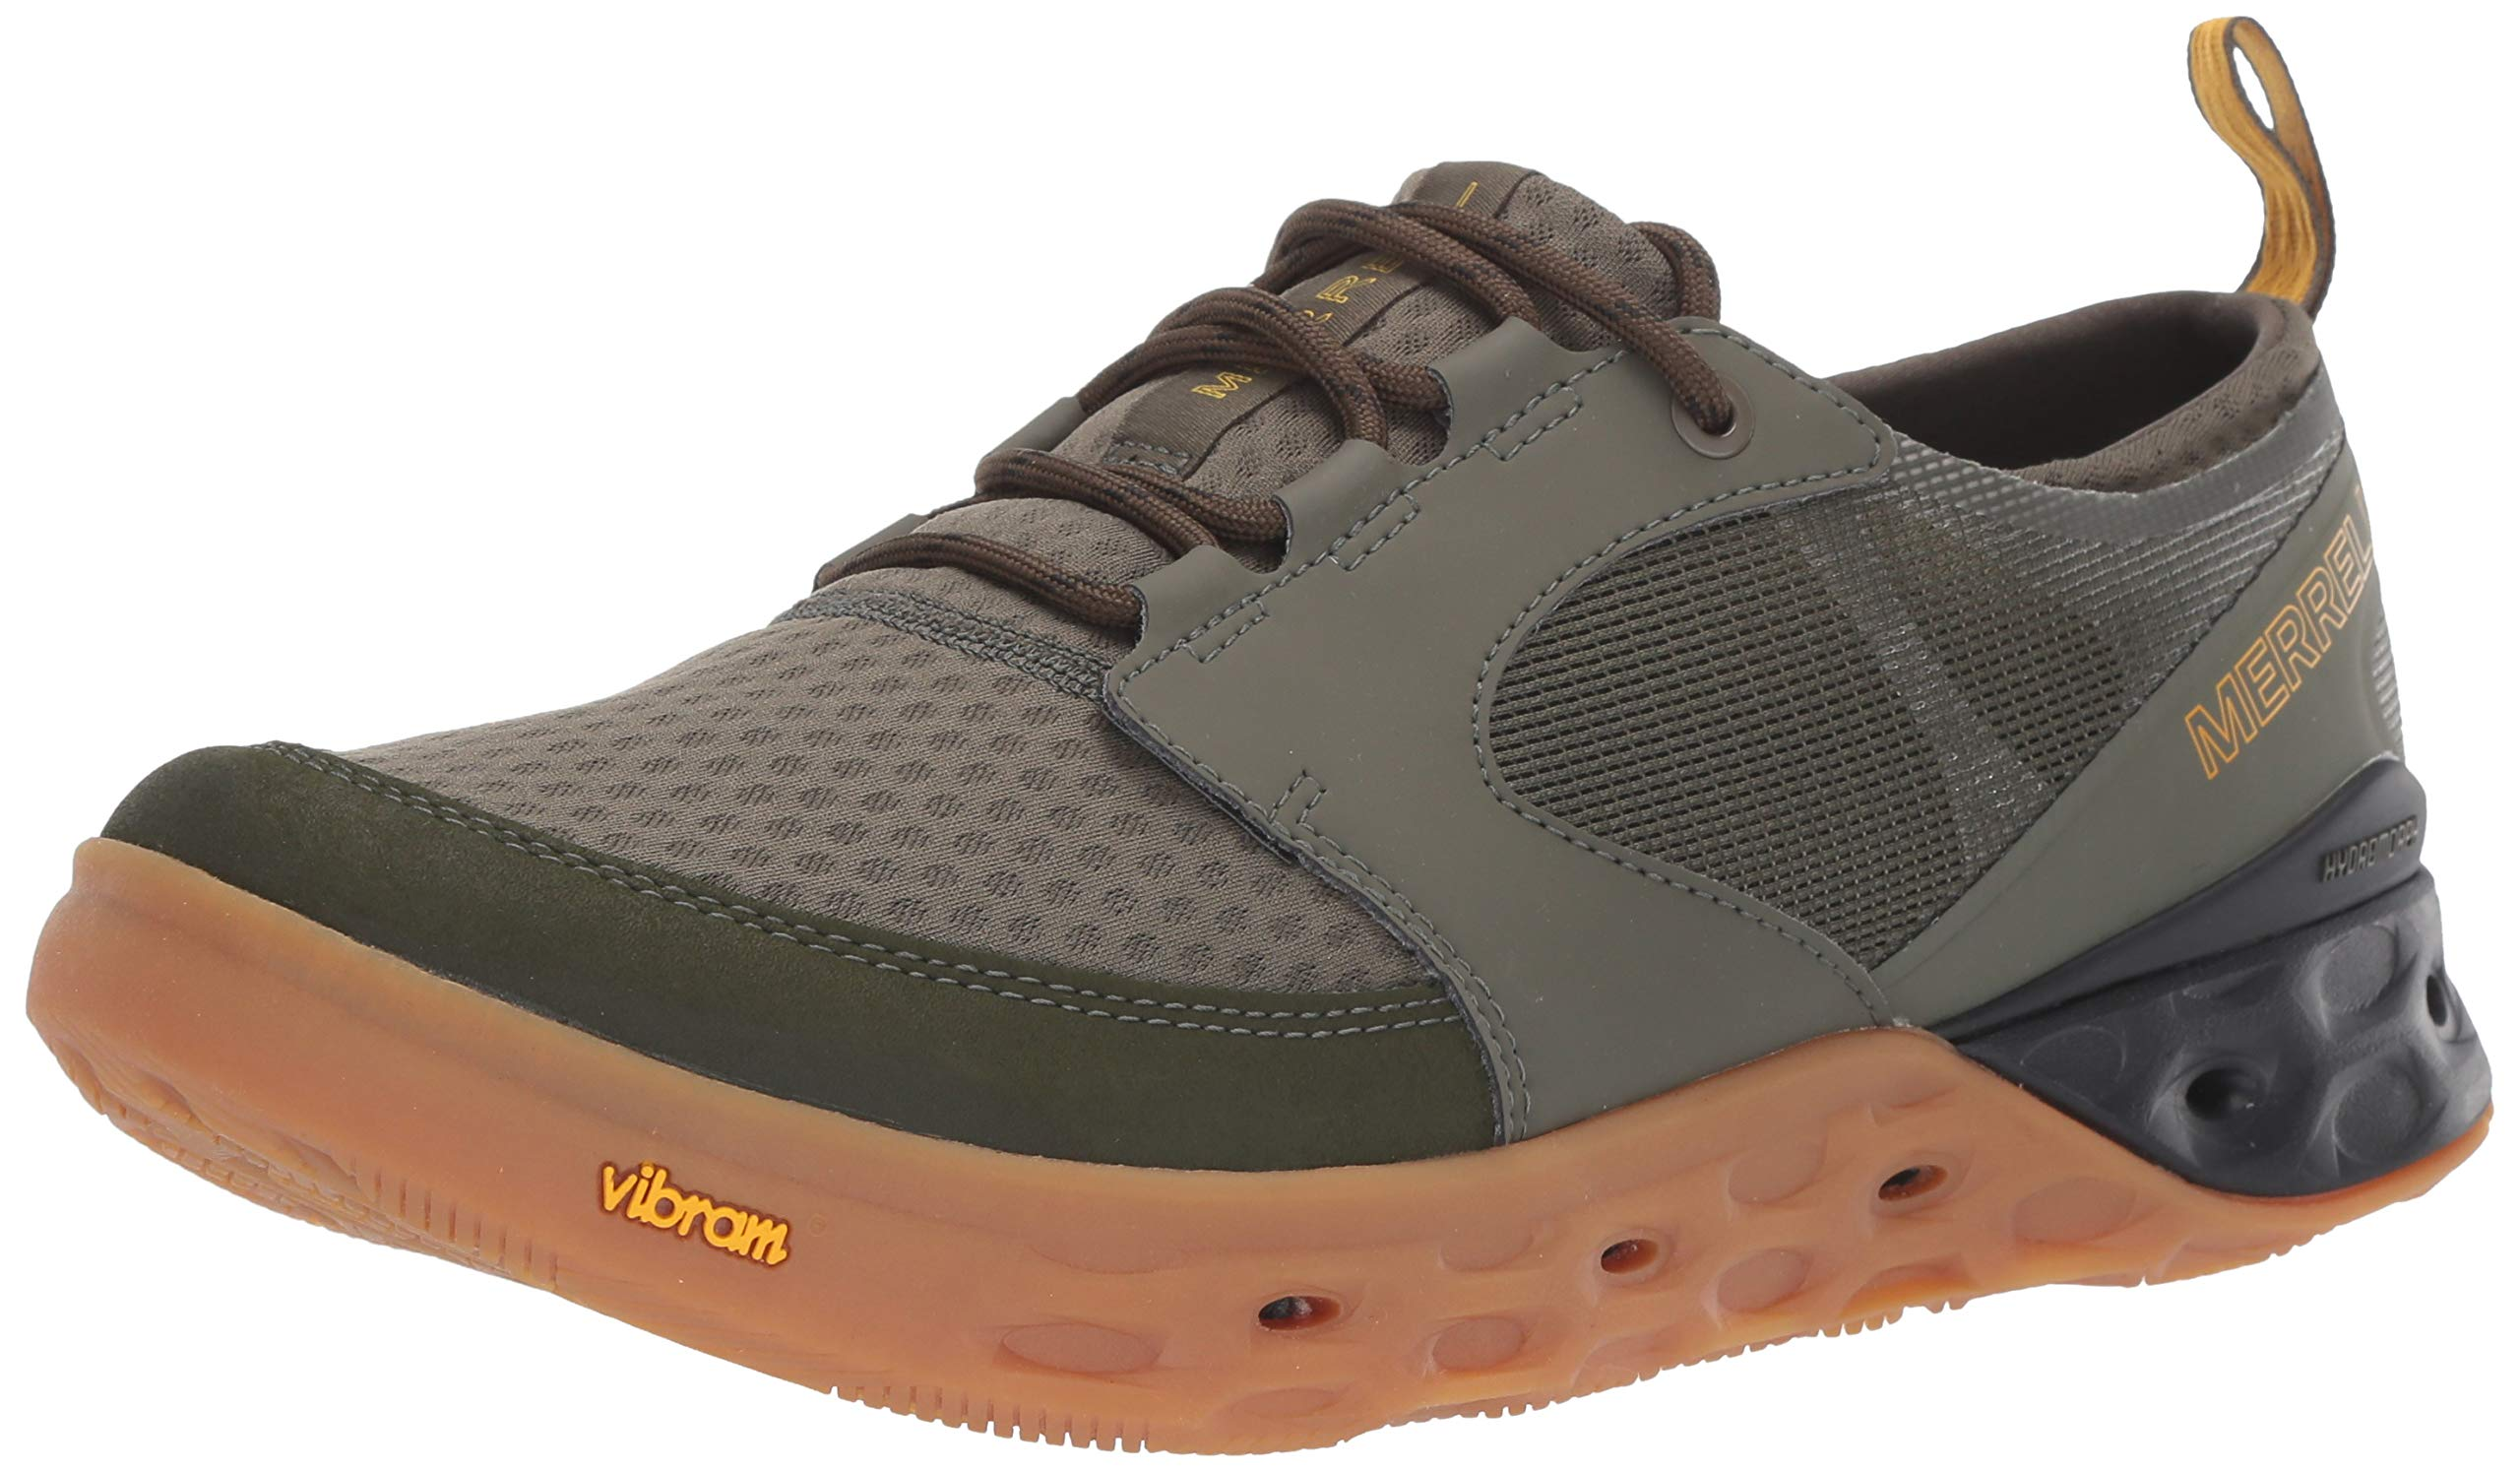 Merrell Men's TIDERISER LACE Water Shoe, Olive, 11.5 M US